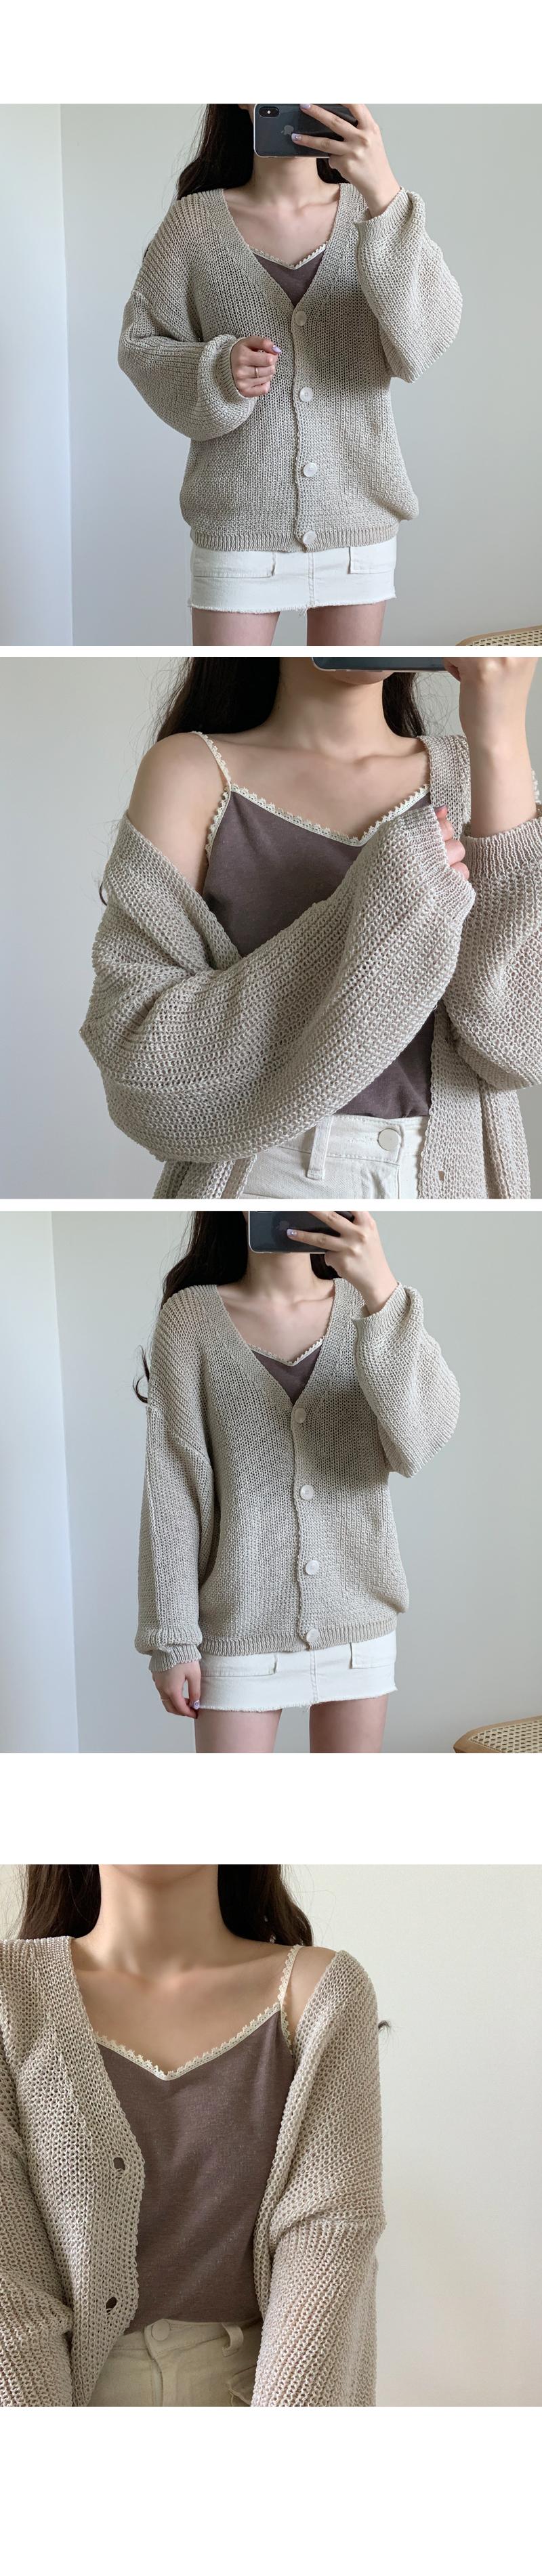 Loose weave cardigan